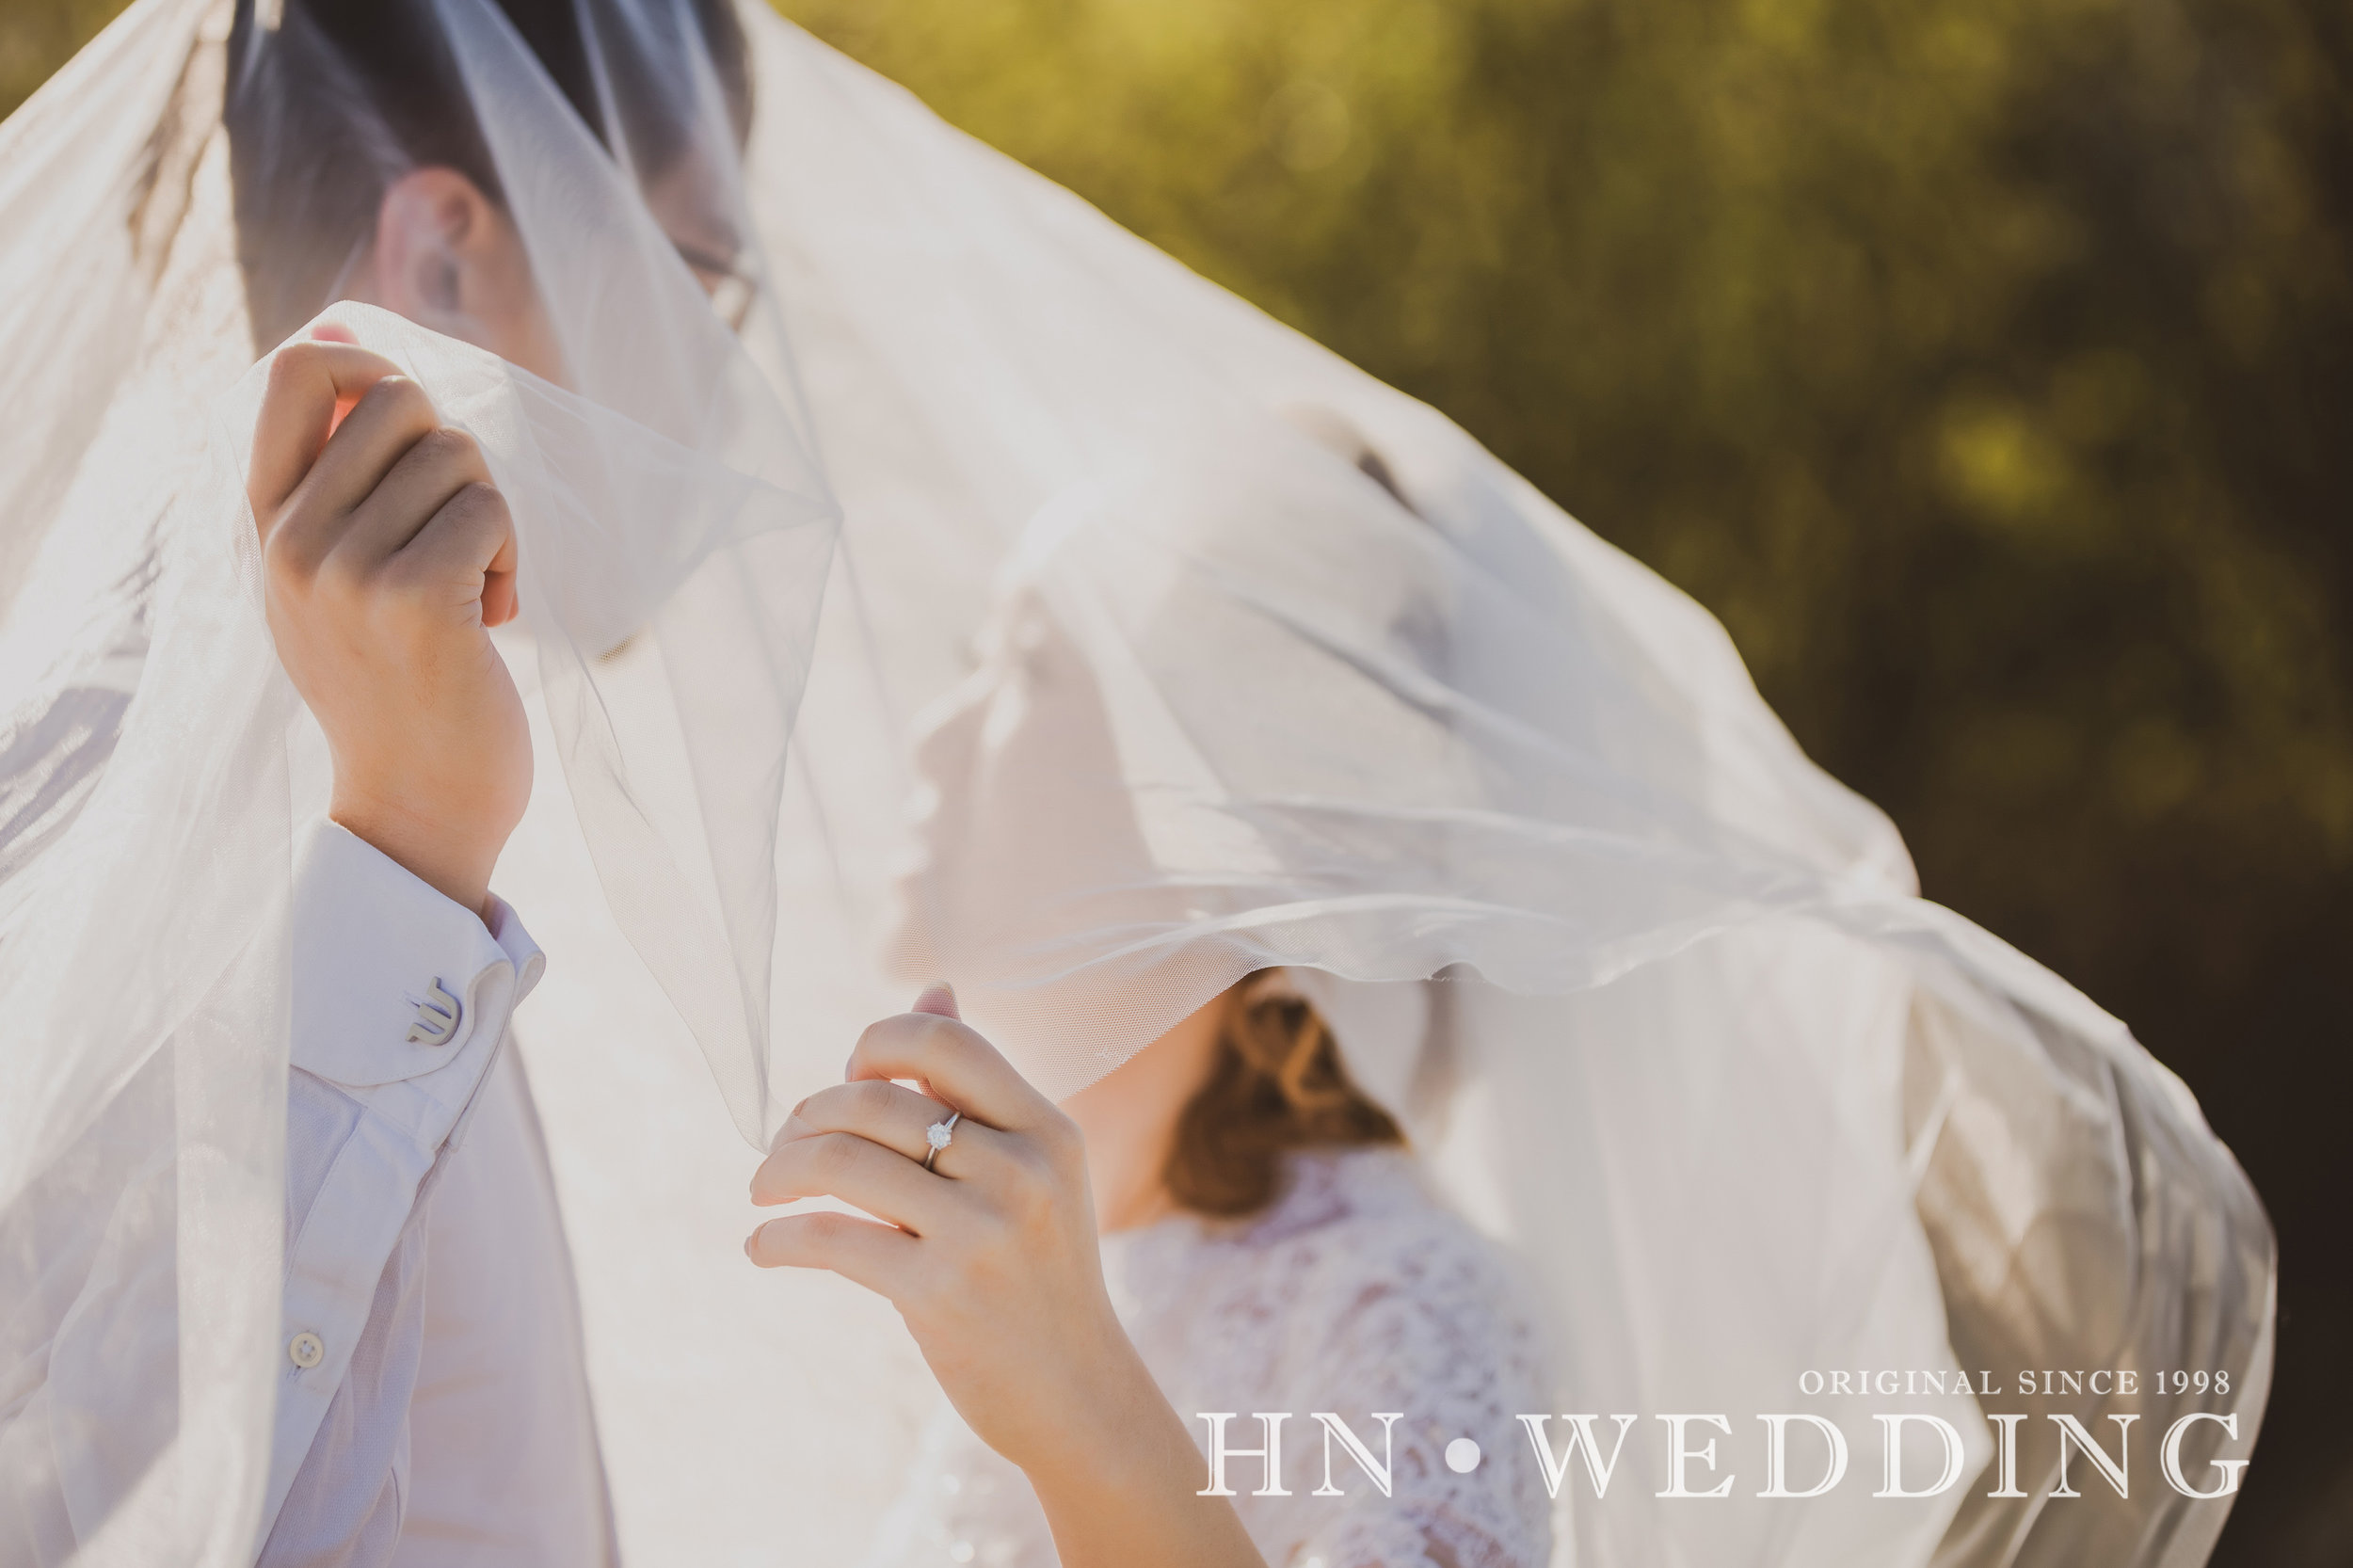 hnweddingweddingdayA&R-40.jpg